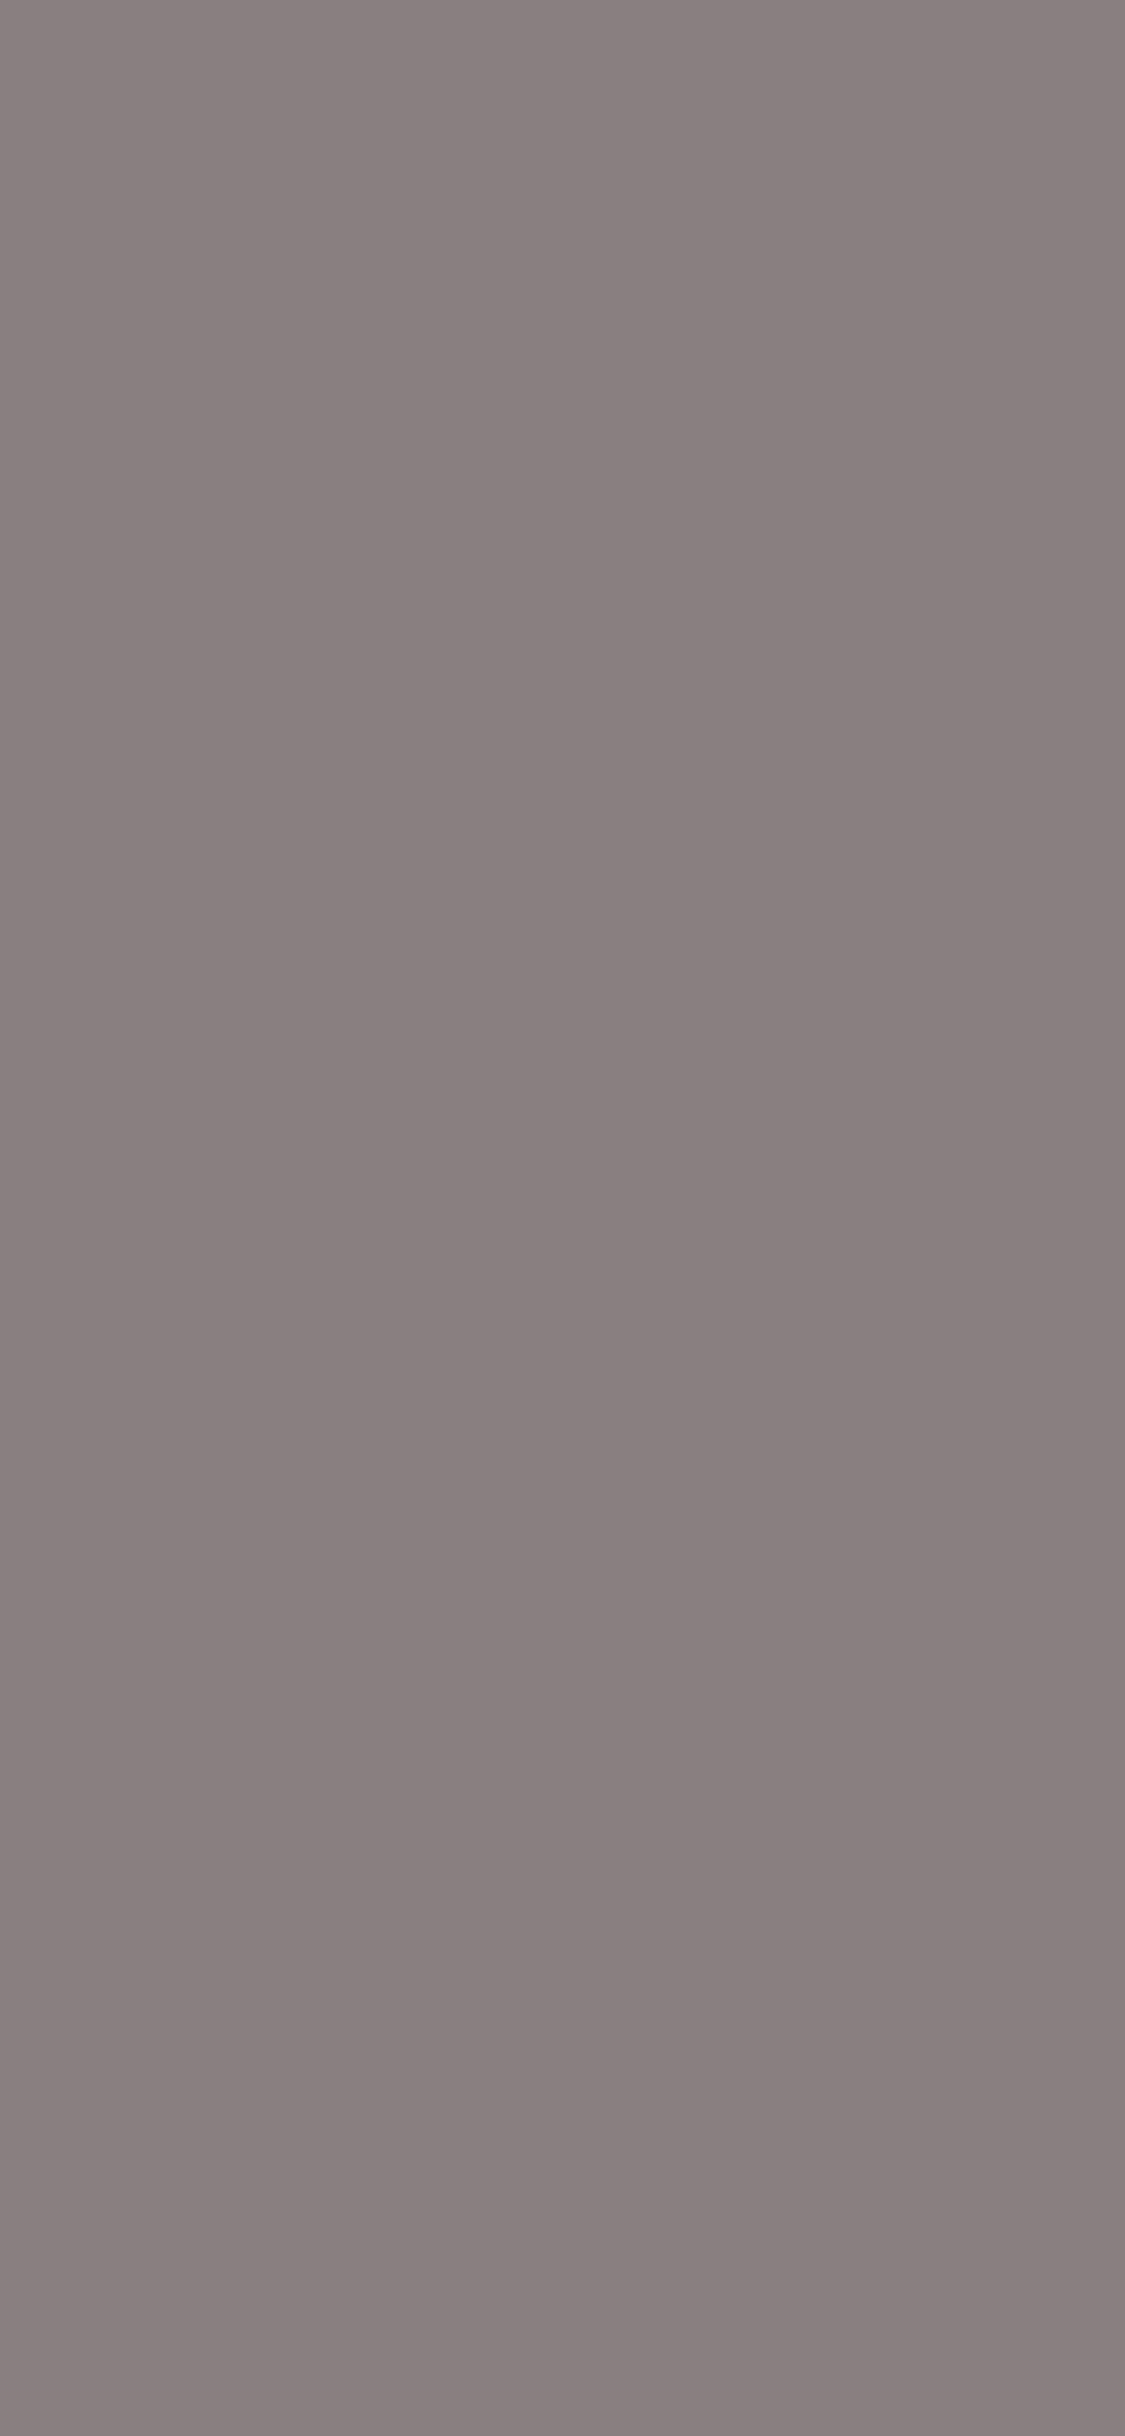 1125x2436 Rocket Metallic Solid Color Background